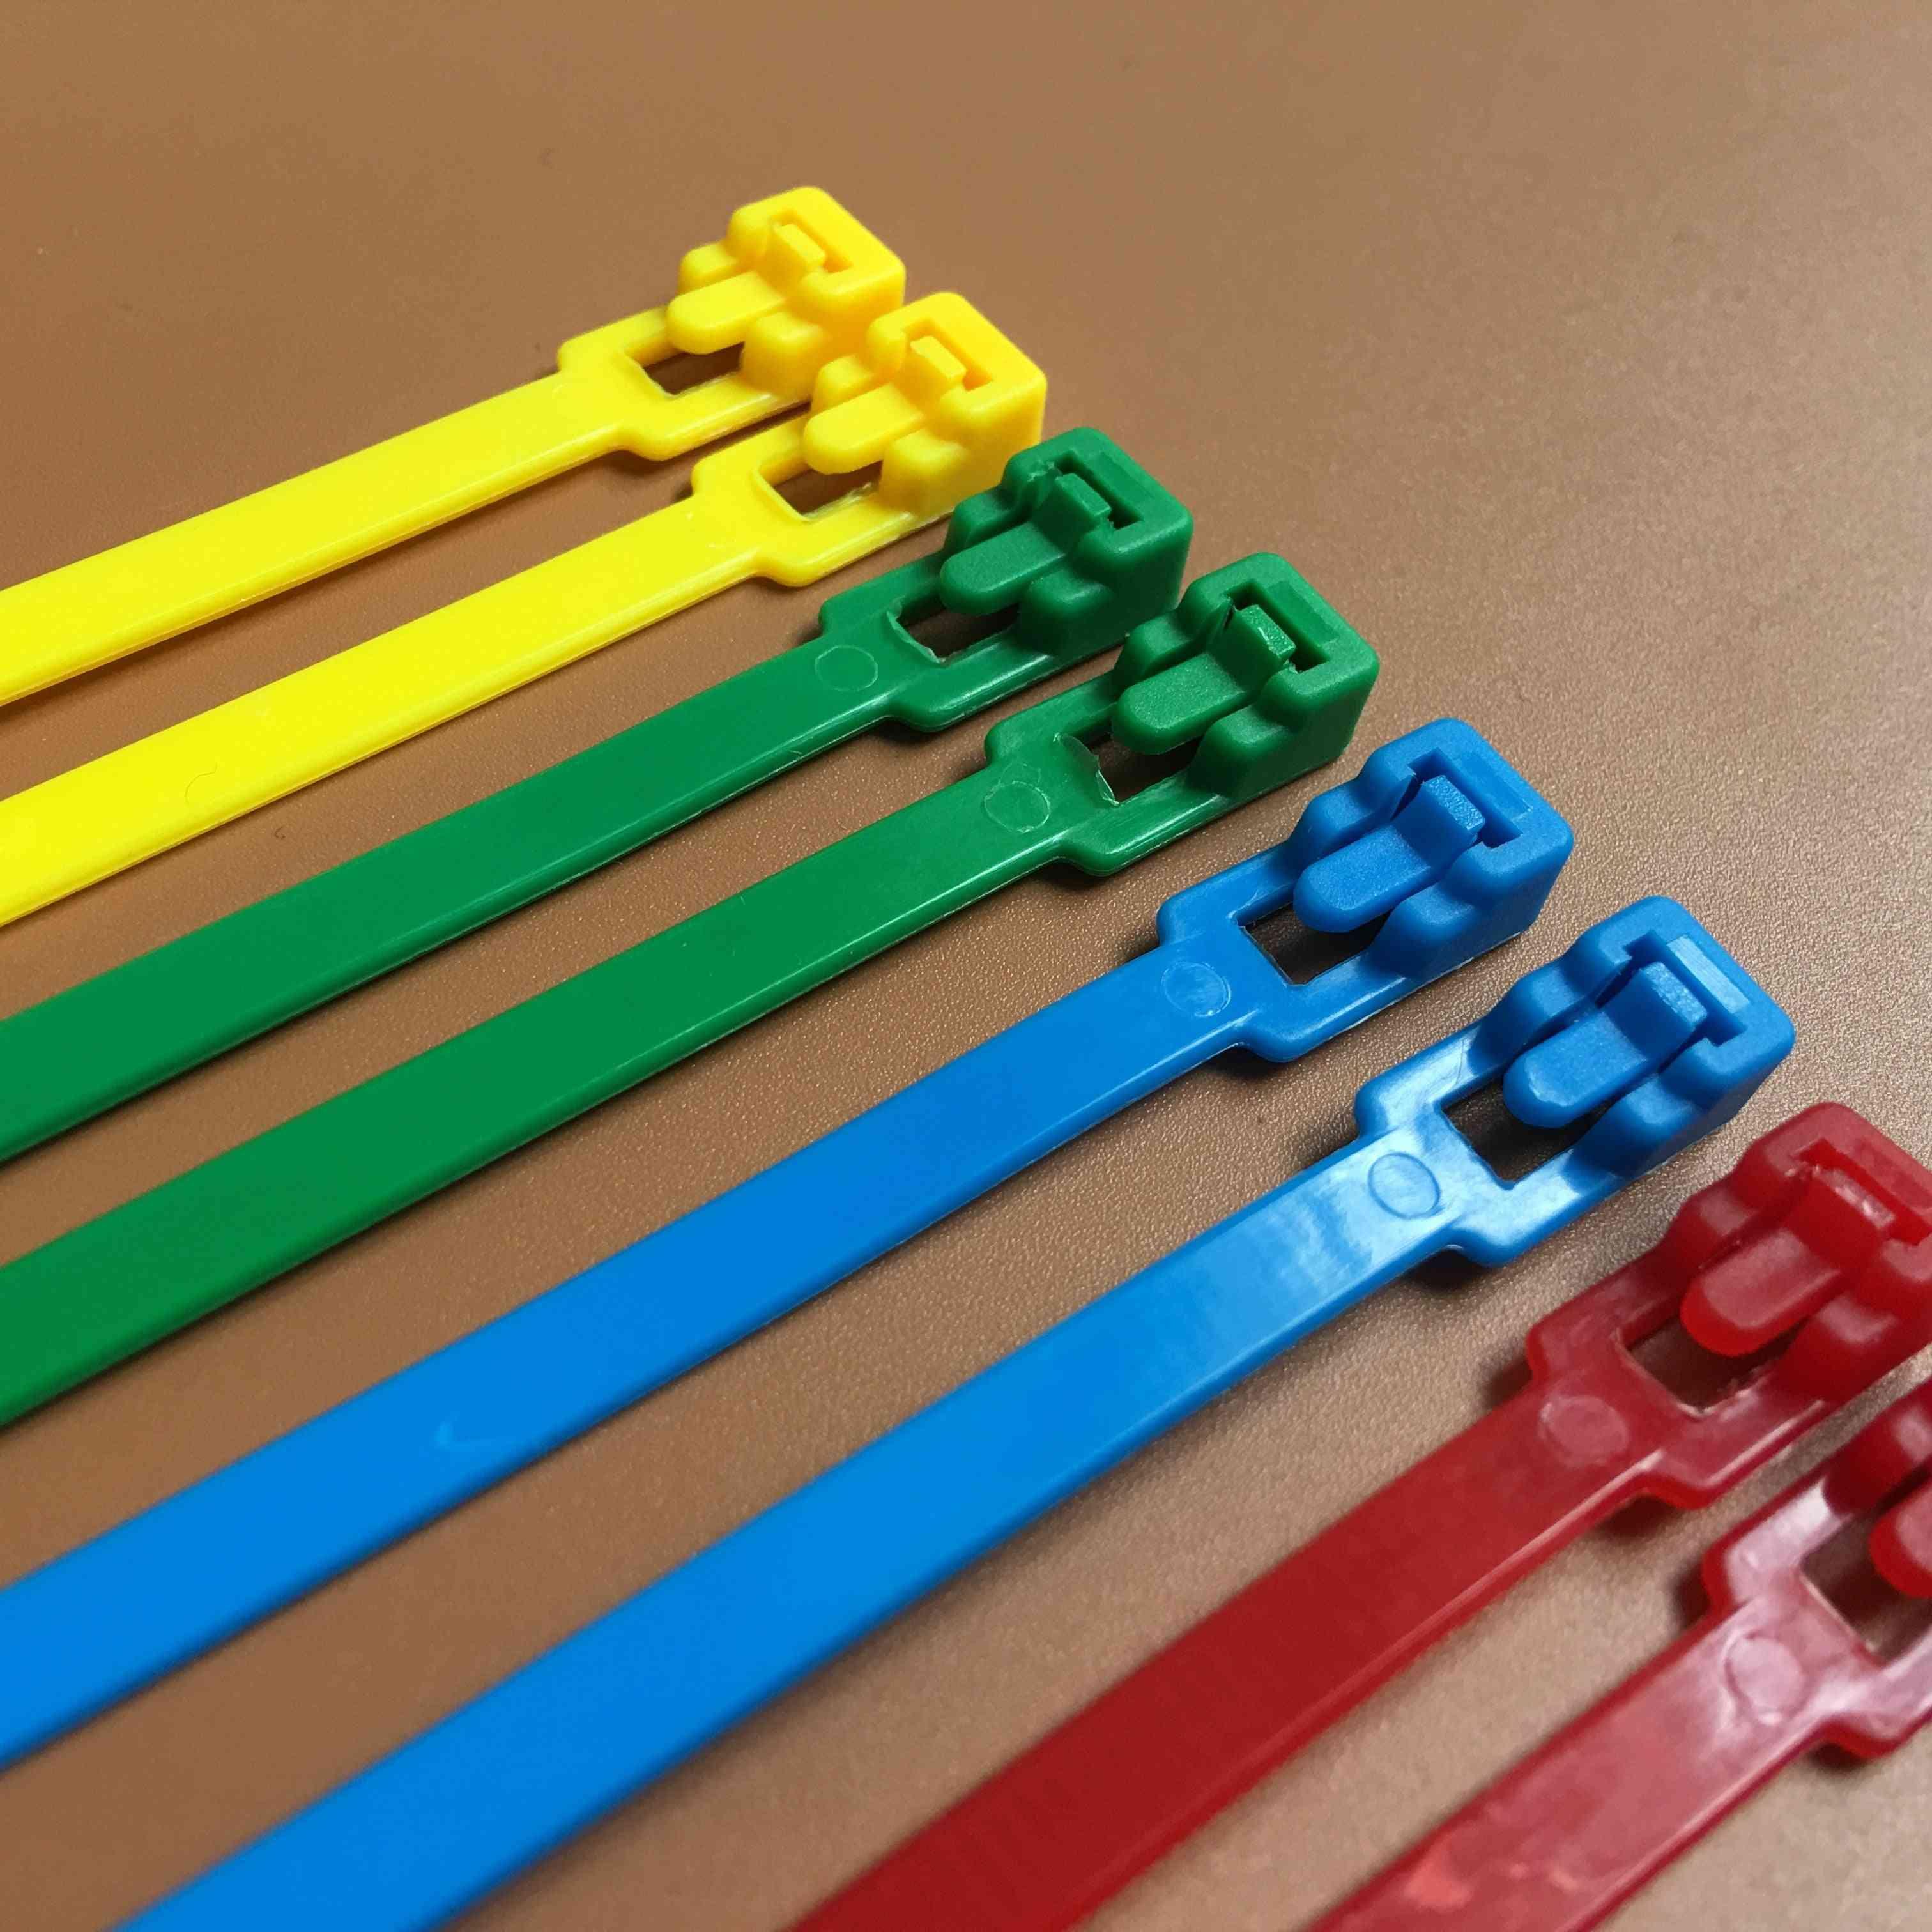 Colored Plastics, Reusable Cable, Loop Wrap Nylon Zip Ties